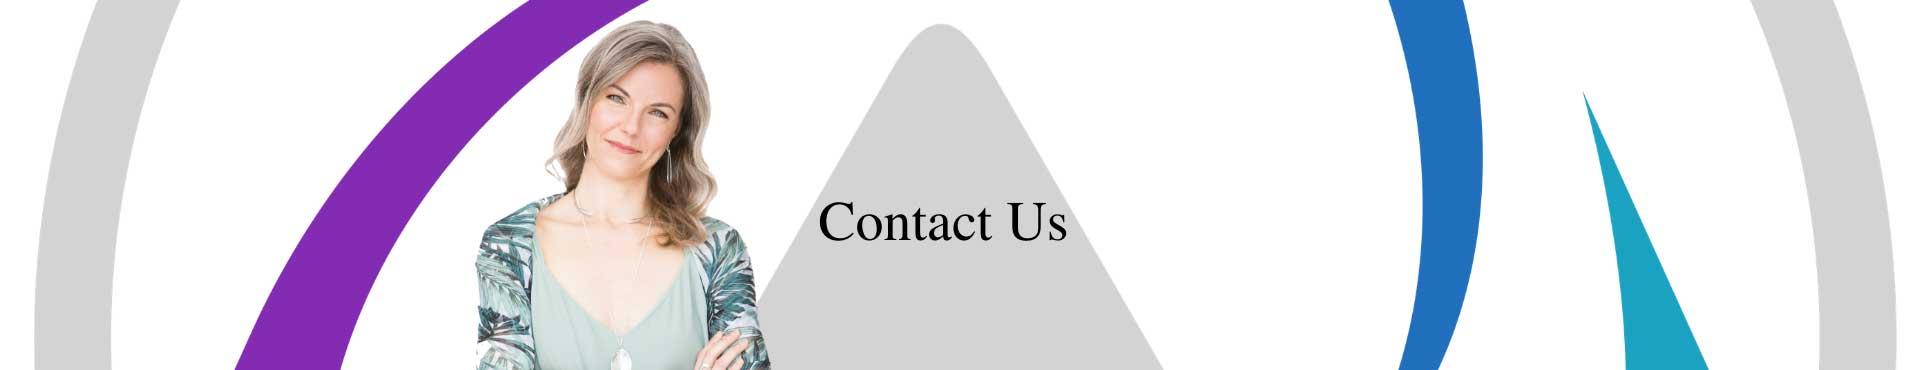 New-Contact-Us-Header